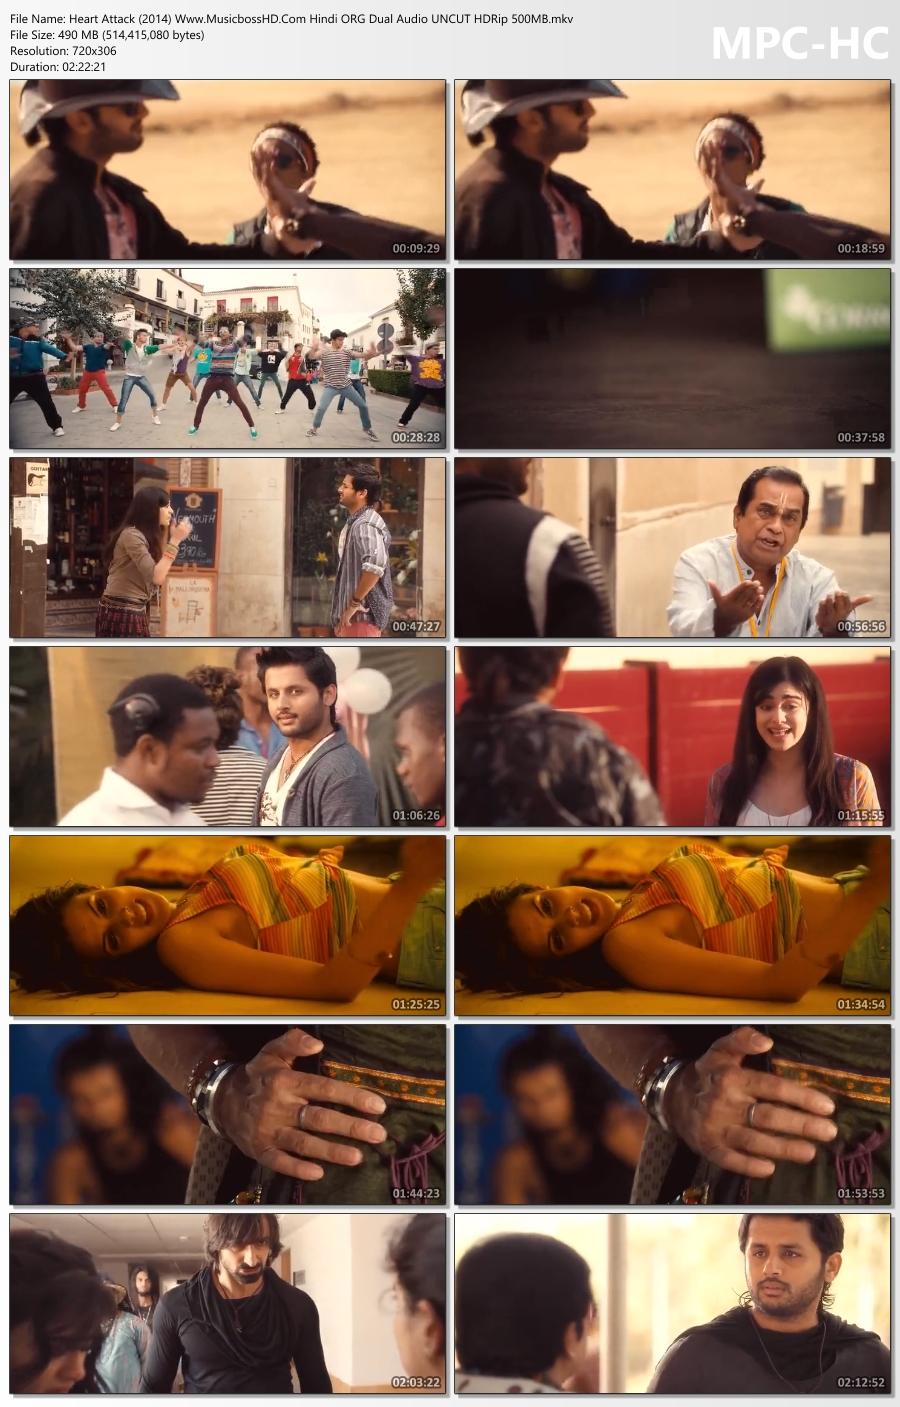 Heart-Attack-2014-Www-Musicboss-HD-Com-Hindi-ORG-Dual-Audio-UNCUT-HDRip-500-MB-mkv-thumbs